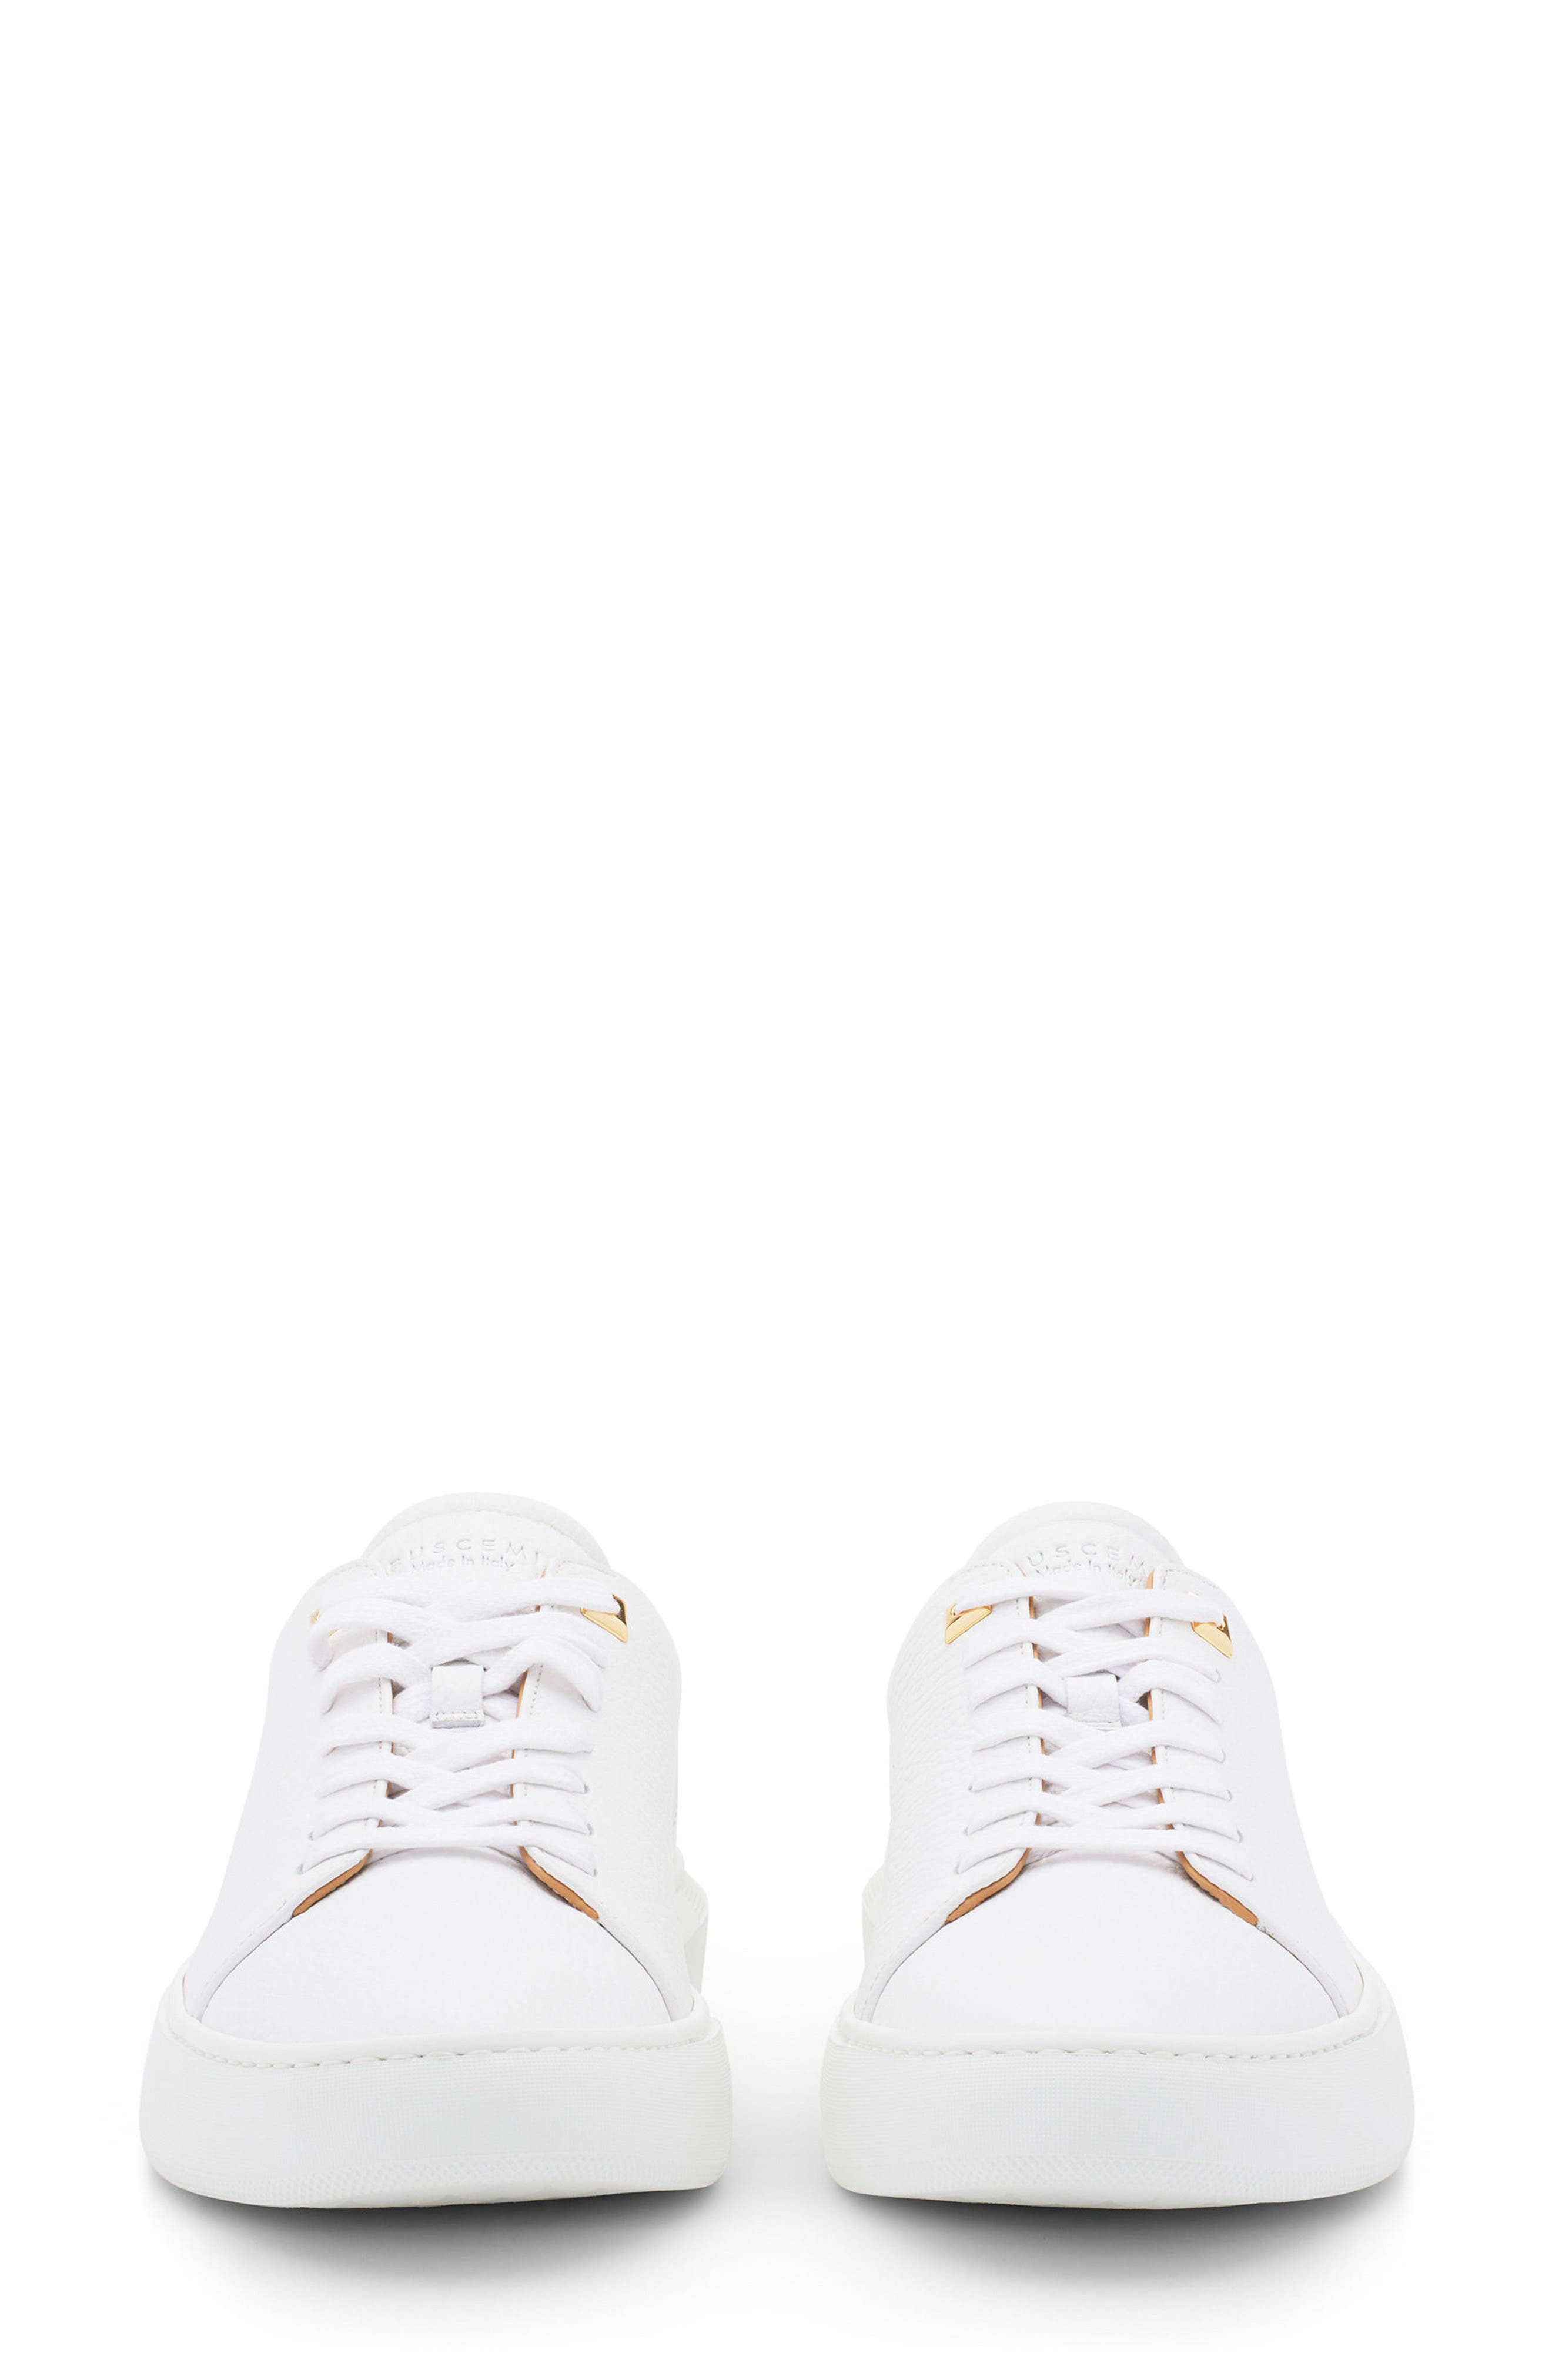 Uno Low Top Sneaker,                             Alternate thumbnail 4, color,                             100